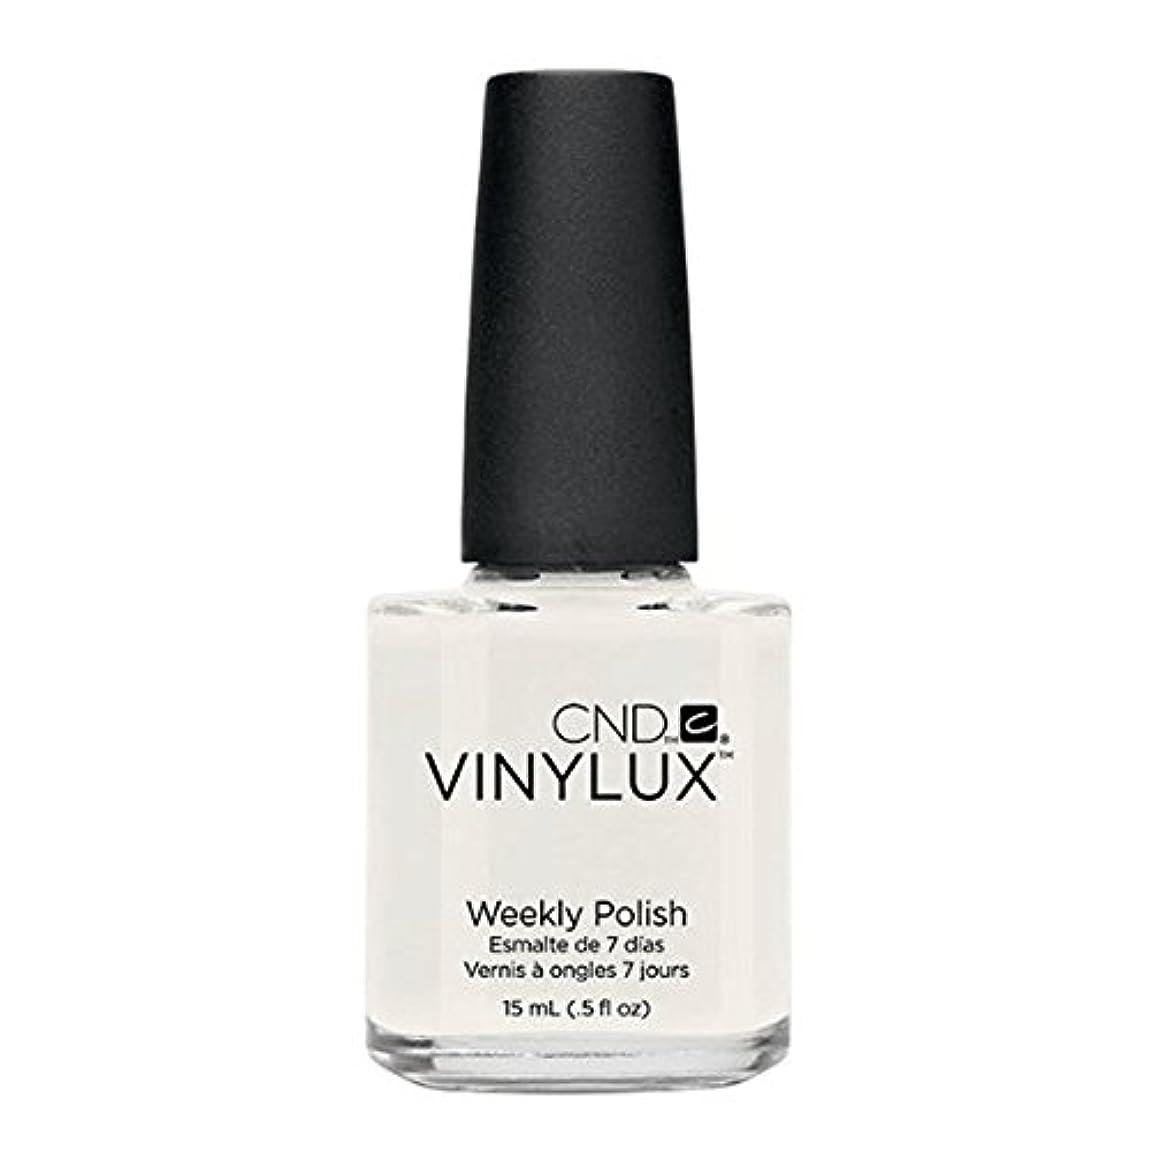 CND Vinylux Manicure Lacquer _ Studio White  #151 _0.5oz